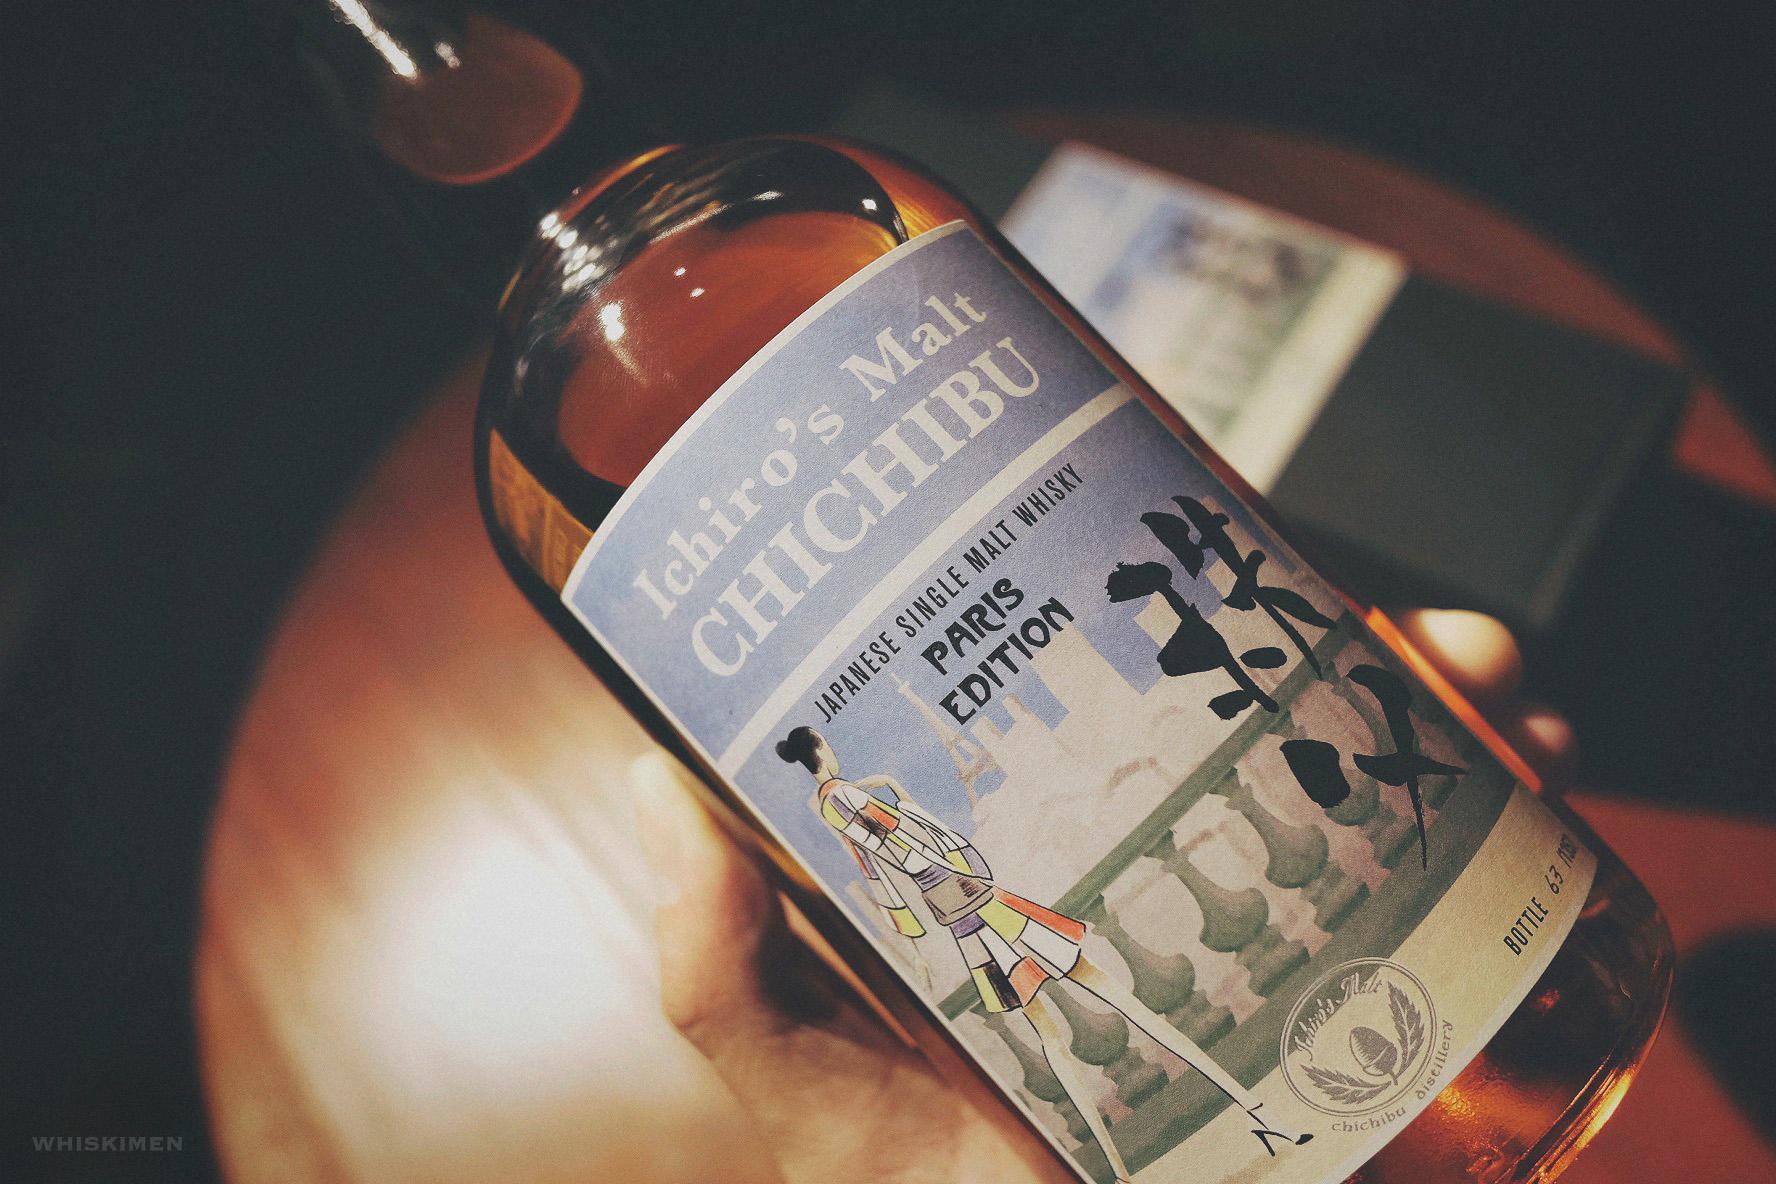 秩父 Chichibu Ichiro's Malt Paris Edition 2018 Single Malt Japanese Whisky